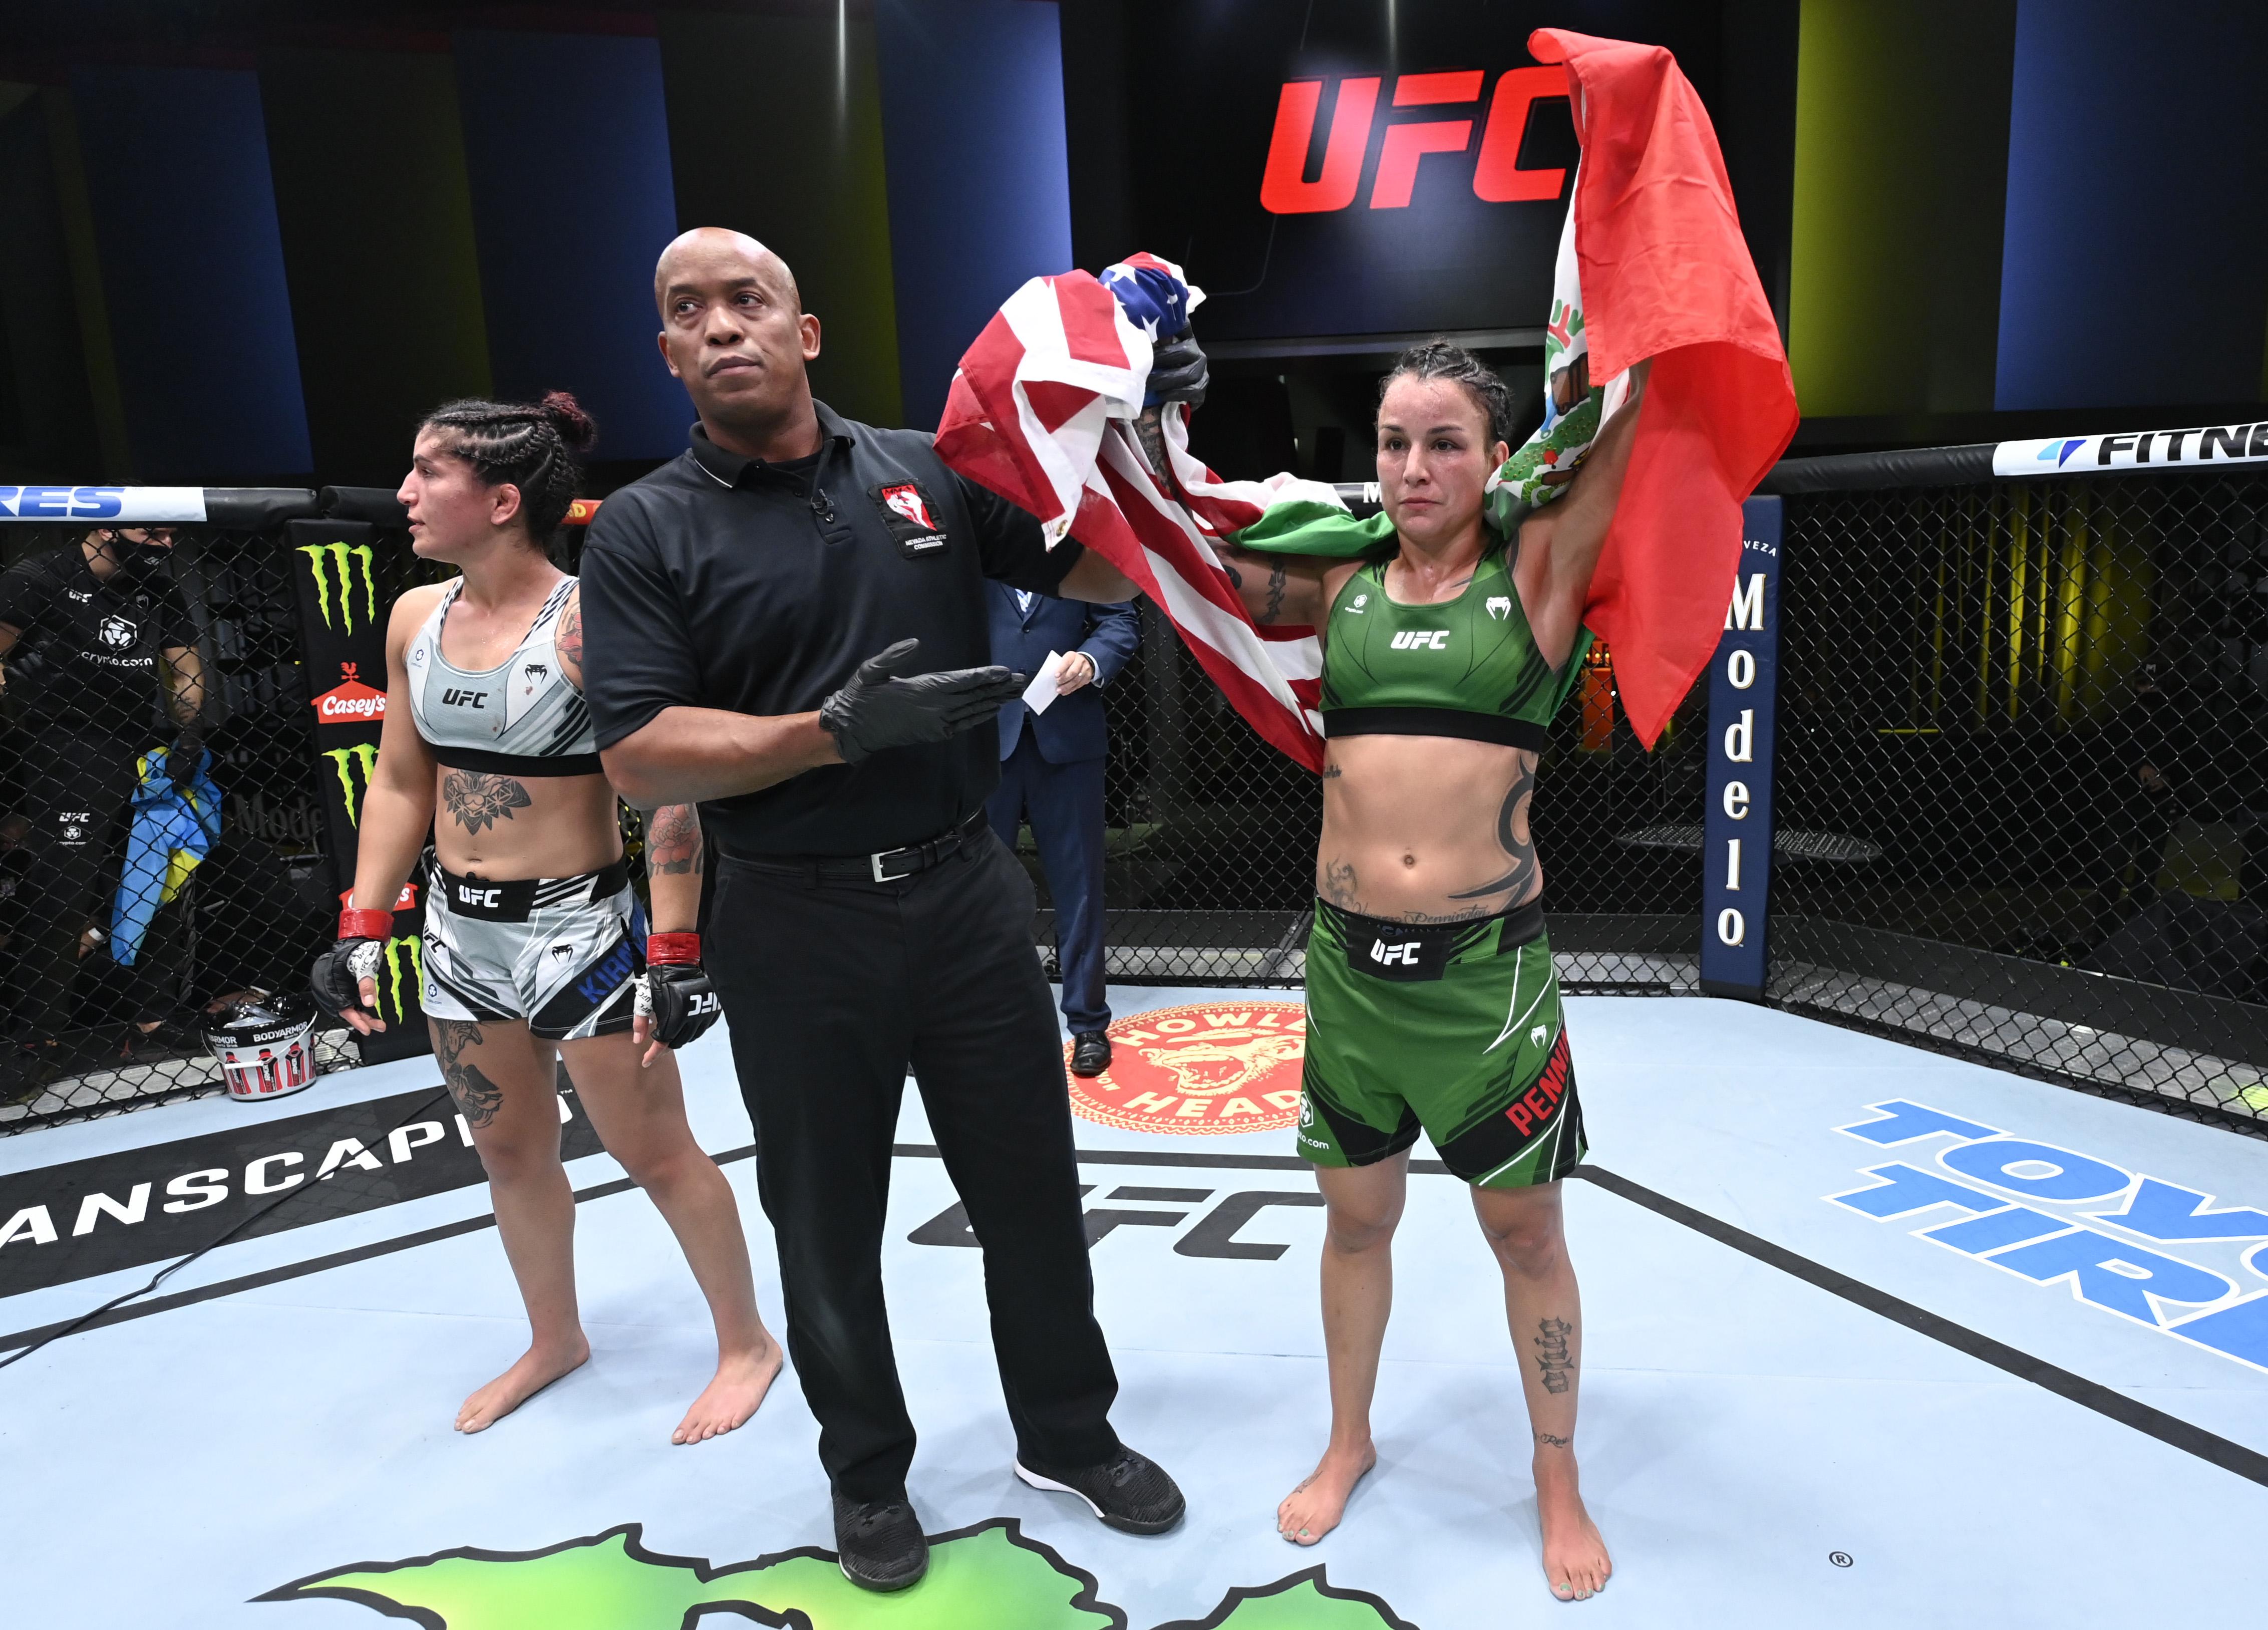 UFC Fight Night: Kianzad v Pennington